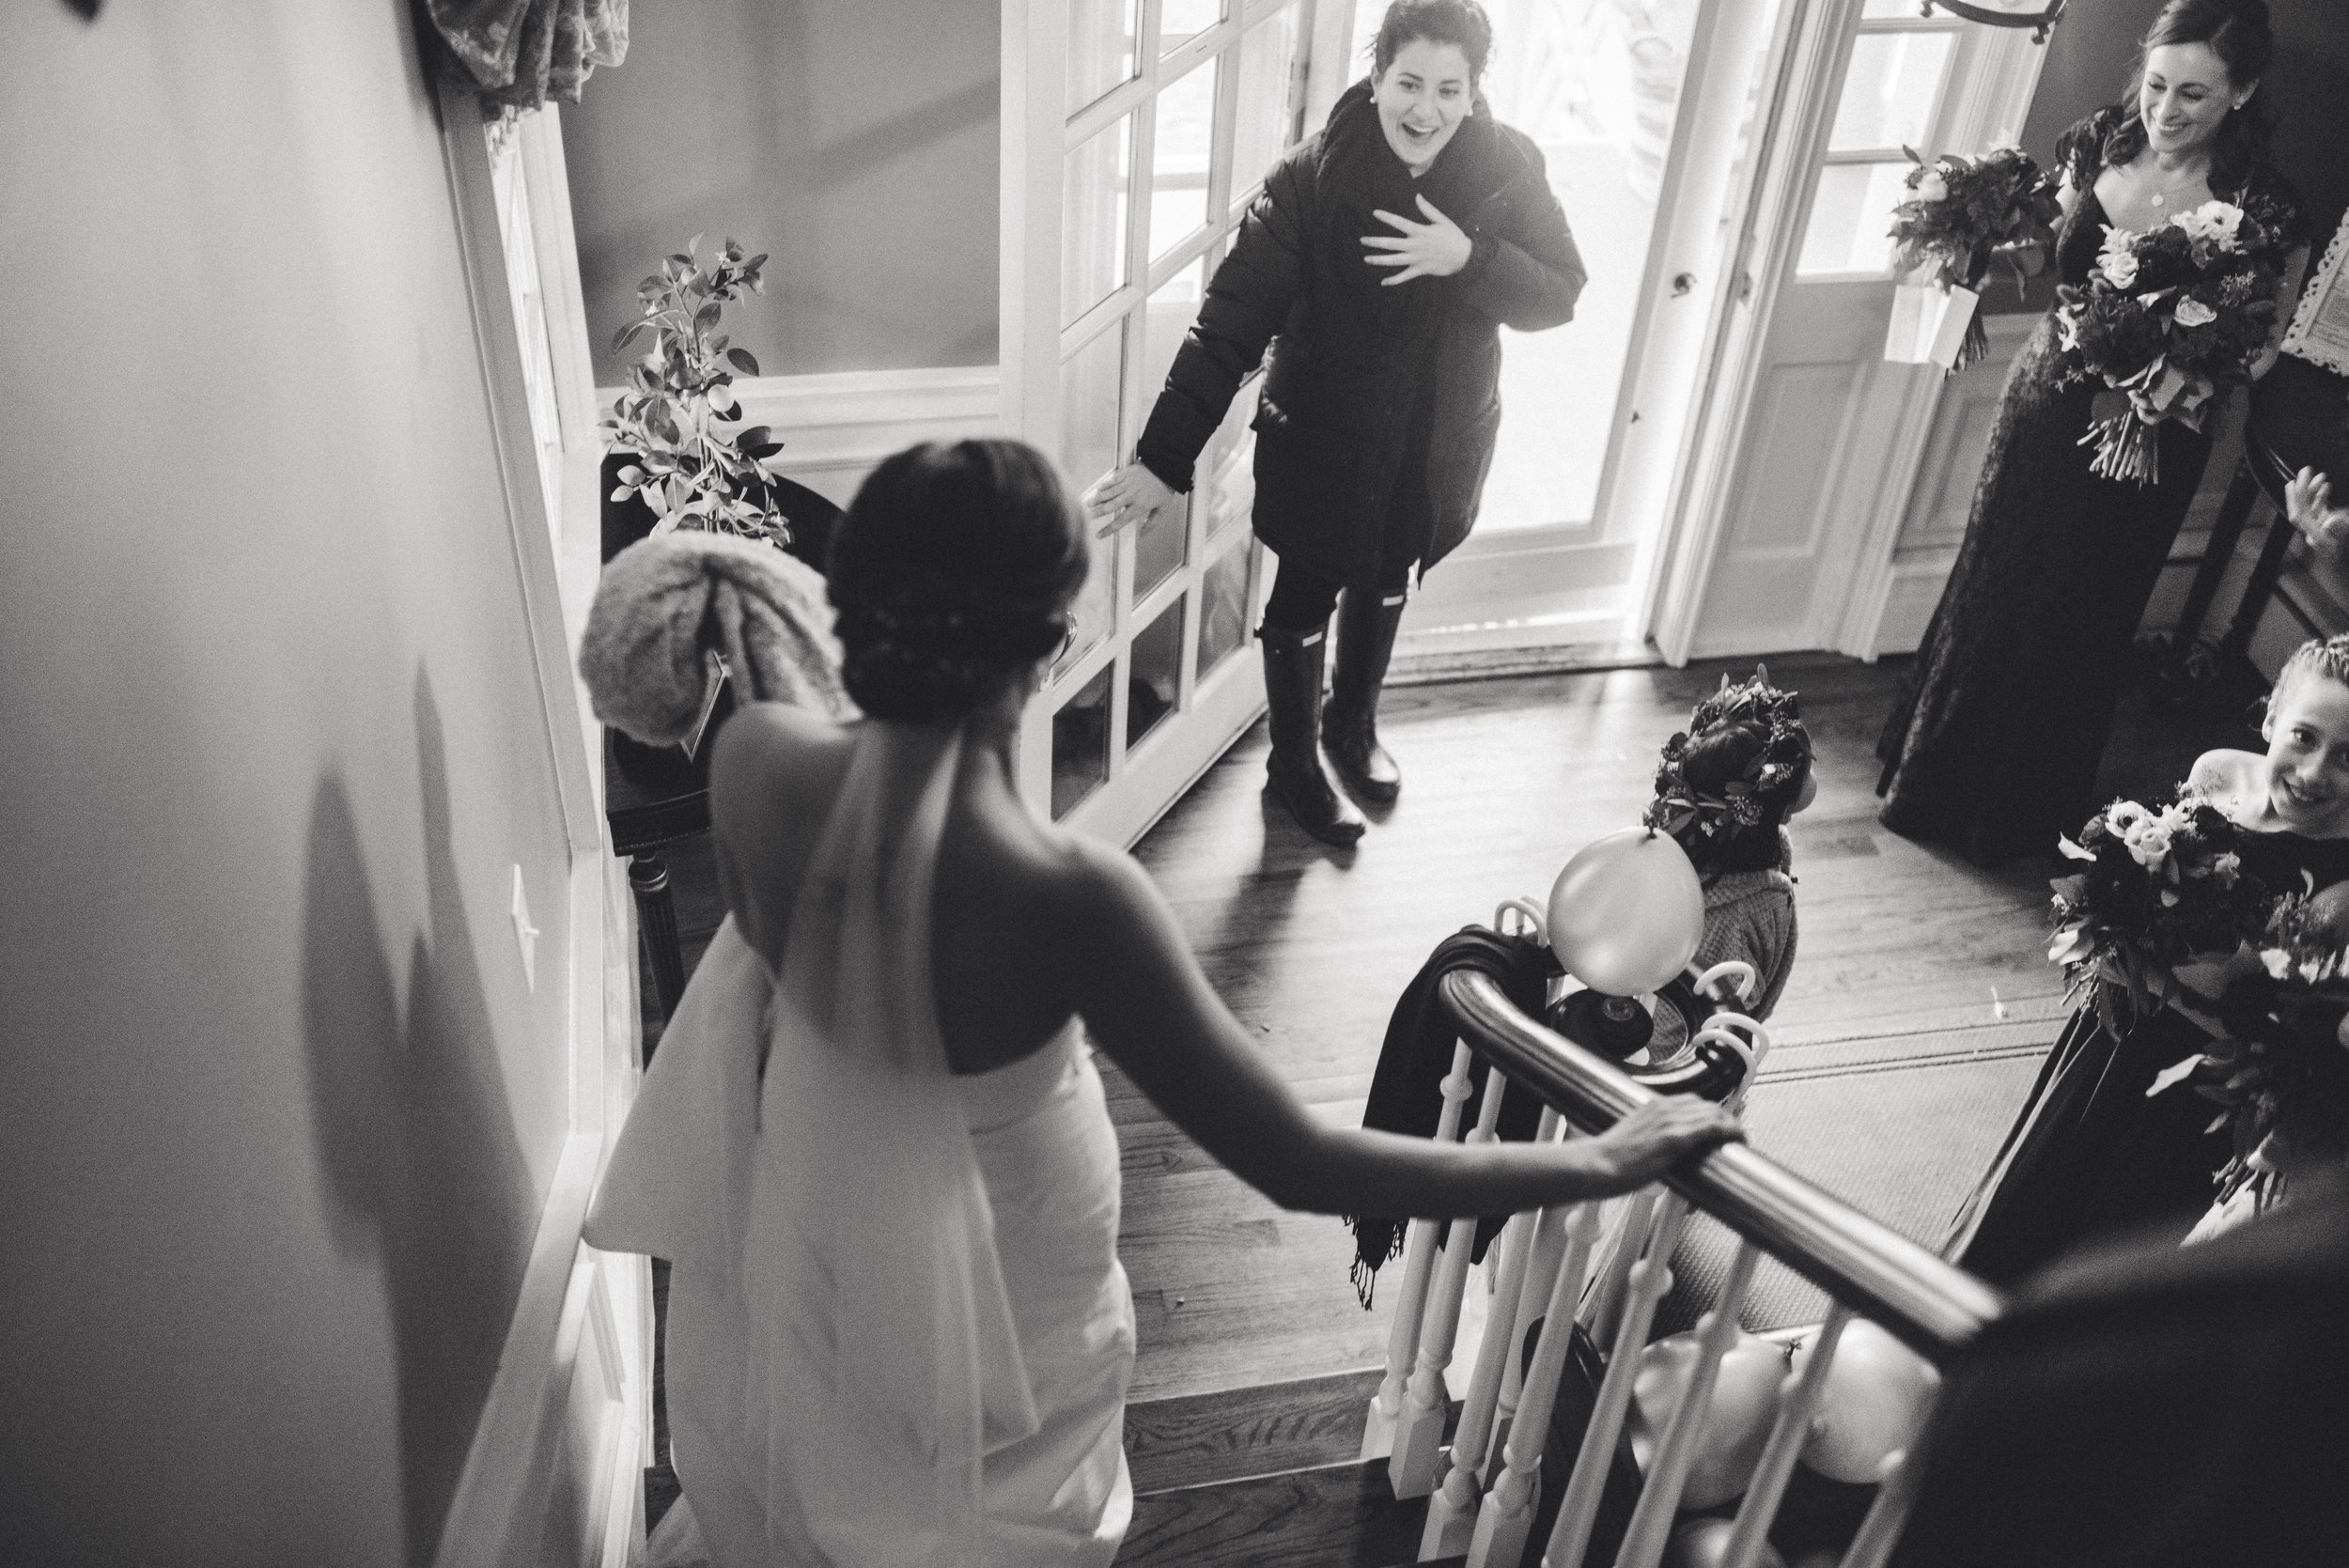 JACQUELINE & ANDREW WARSHAWER -BROOKMILL FARM FALL WEDDING - INTIMATE WEDDING PHOTOGRAPHER - TWOTWENTY by CHI-CHI AGBIM-191.jpg